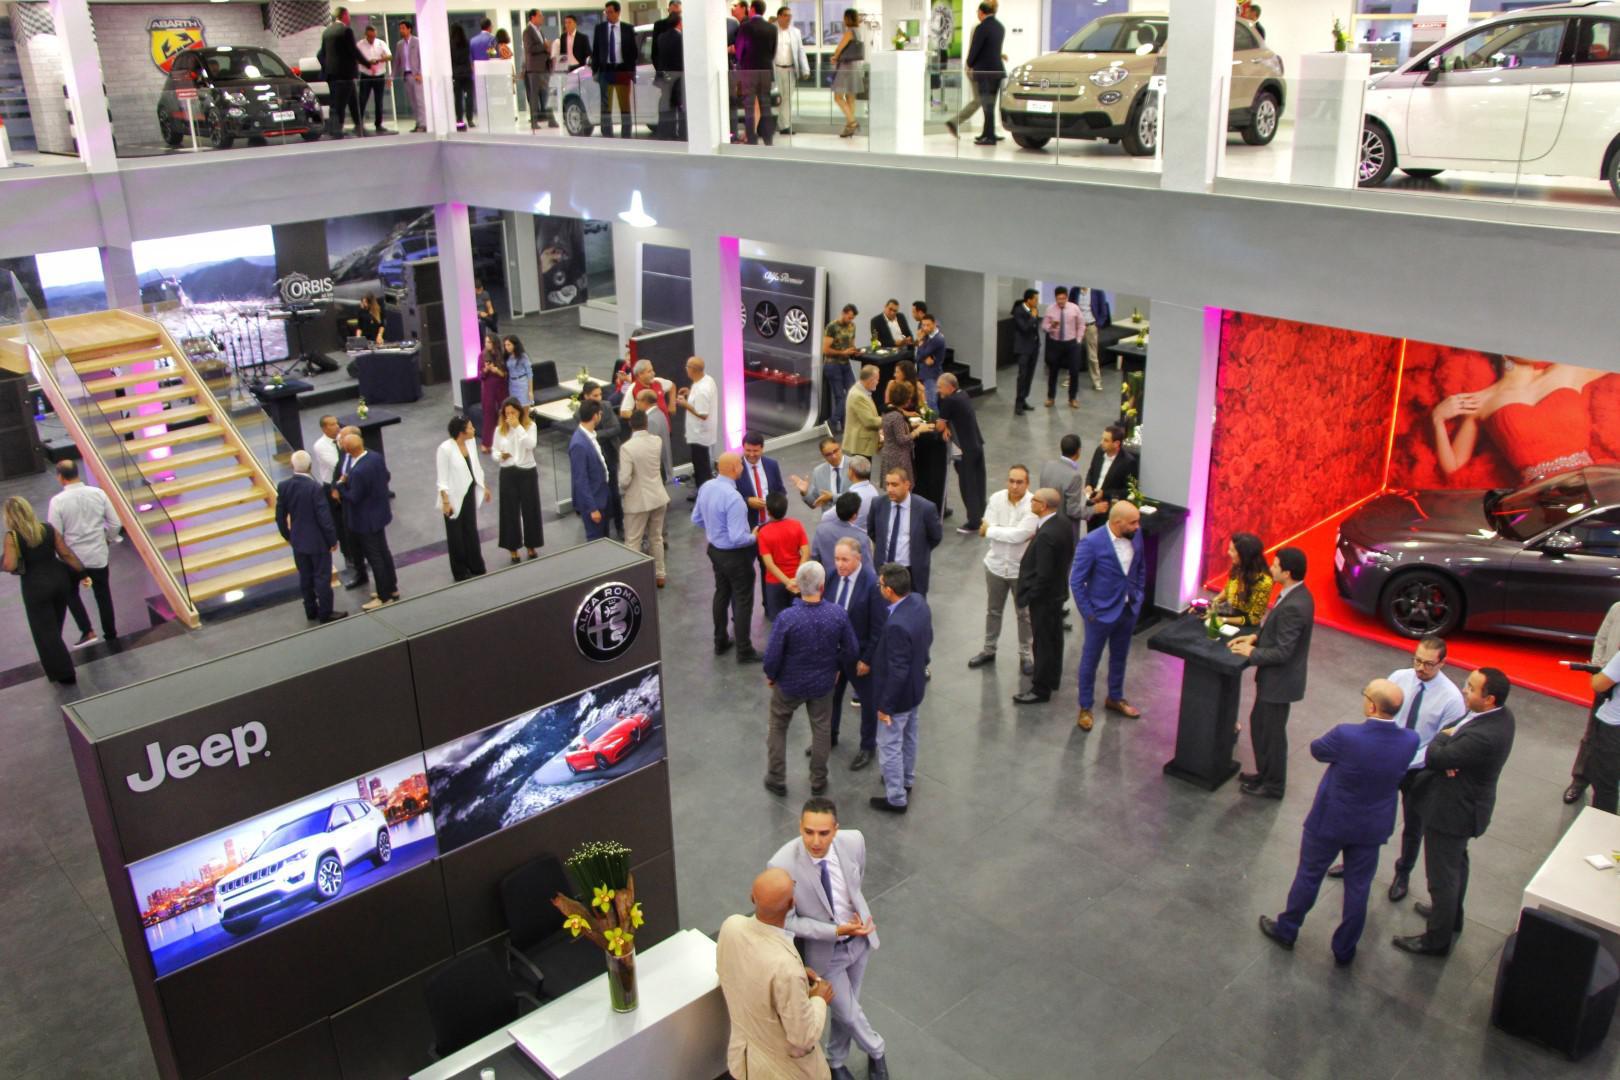 orbis-automotive-inaugure-son-nouveau-showroom-a-rabat-1119-7.jpg